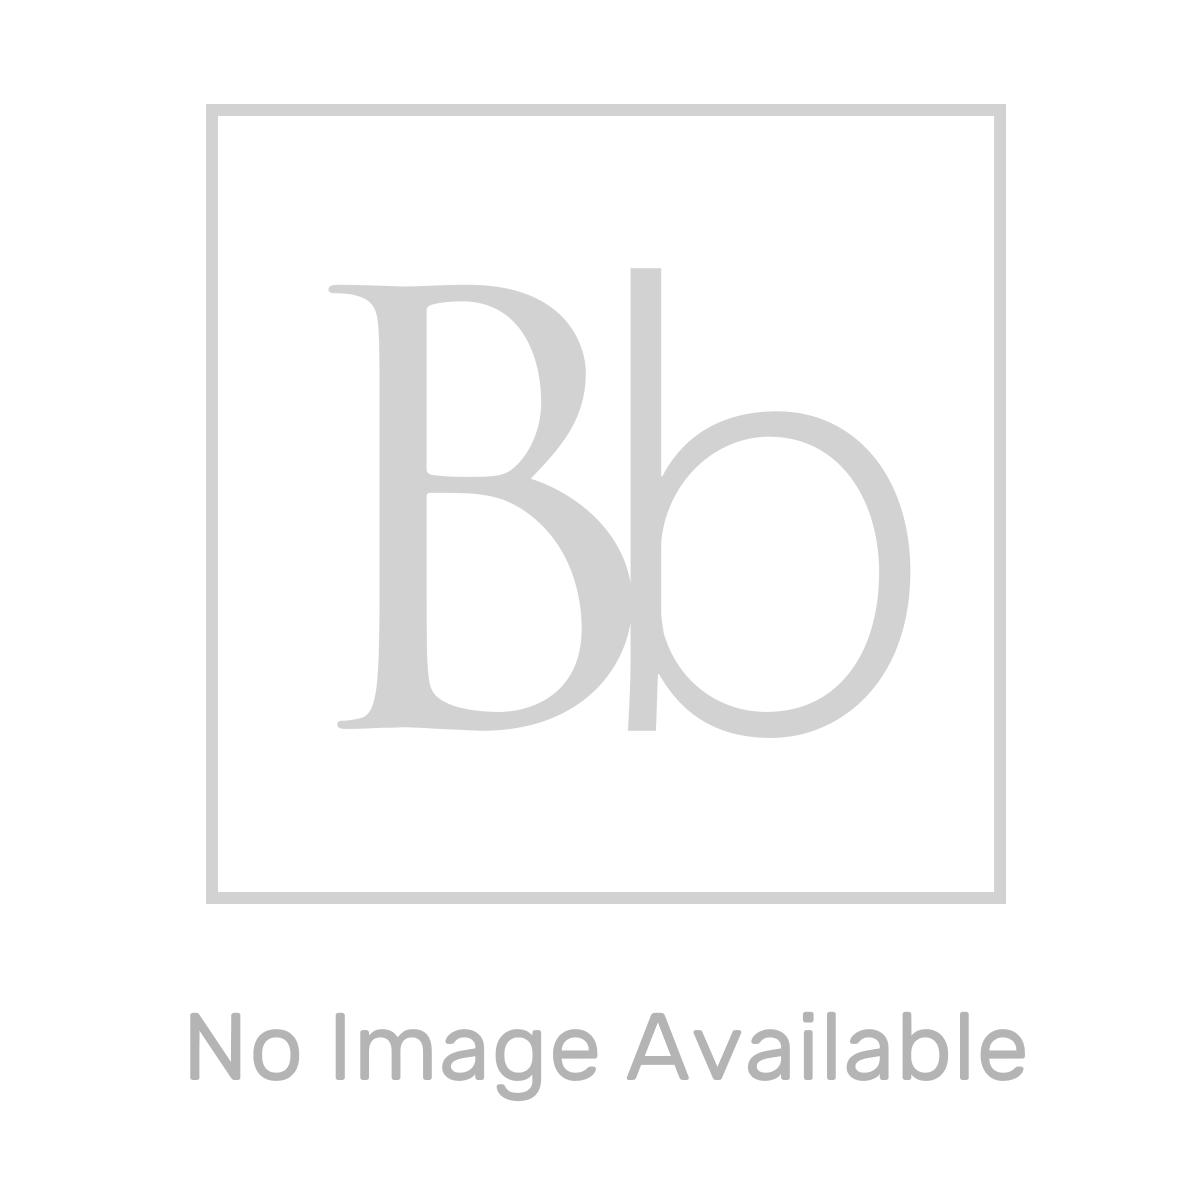 Aquadart Square 900 x 900 Shower Tray